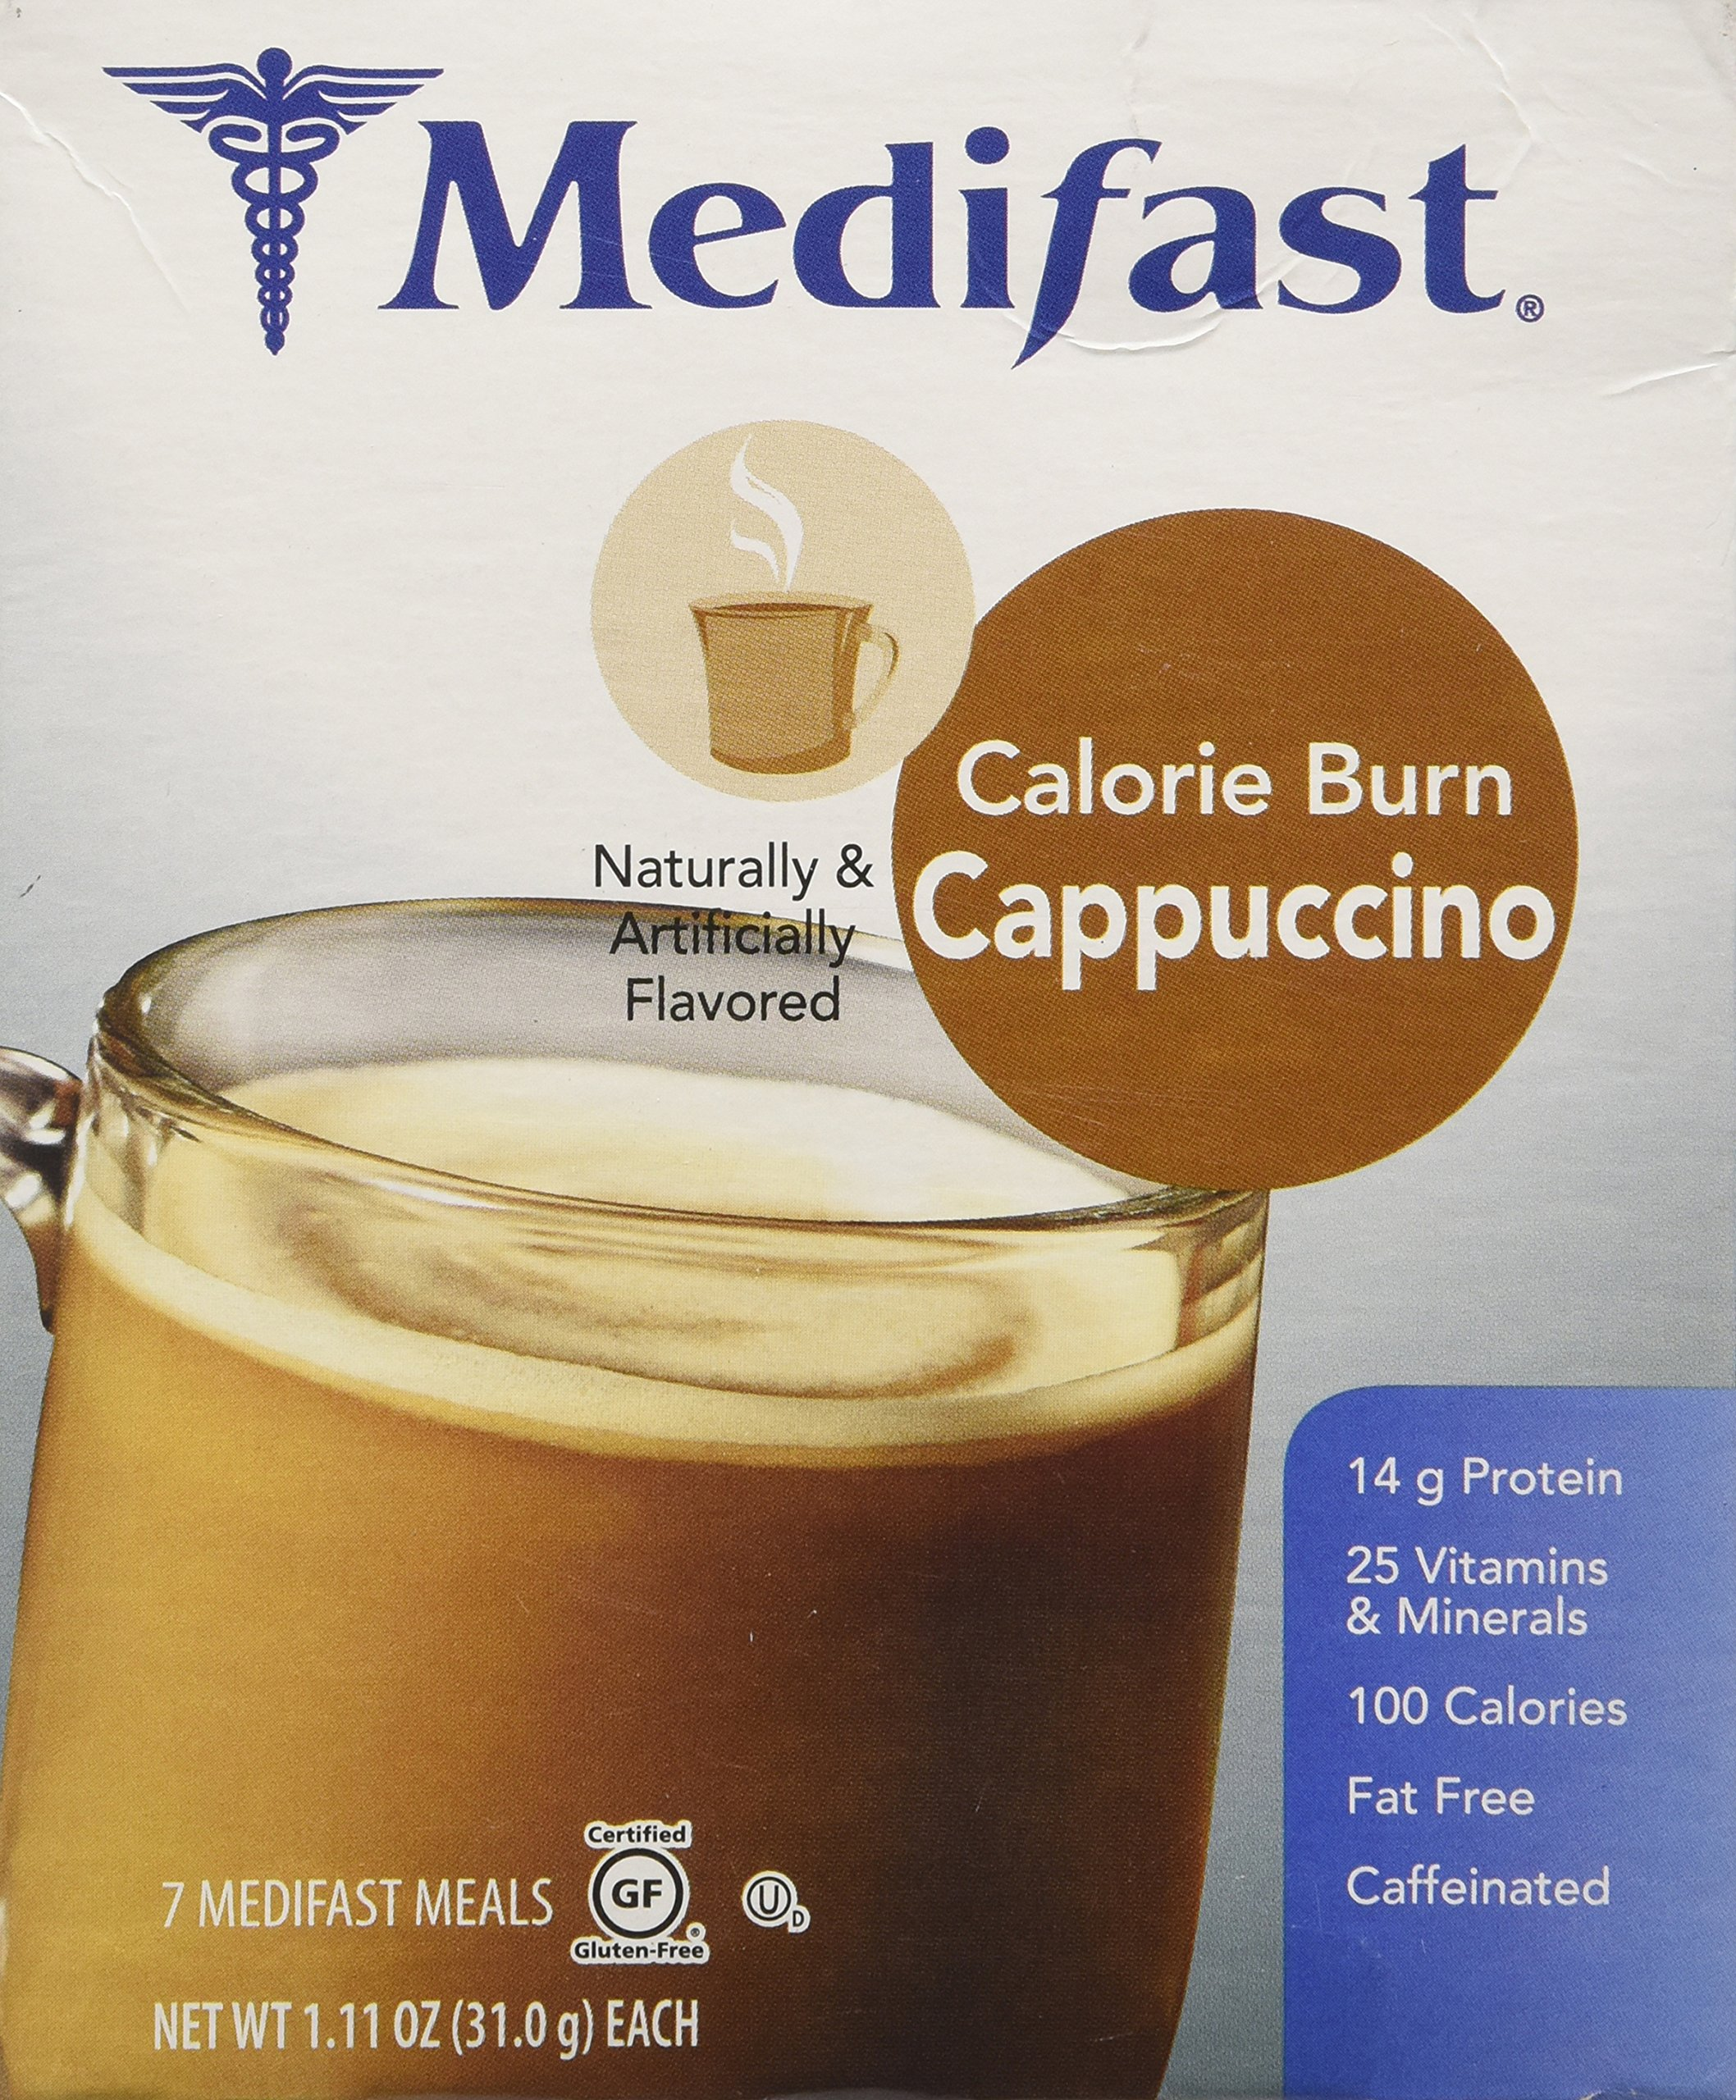 Medifast Essential Calorie Burn Cappuccino (1 Box/7 Meals)